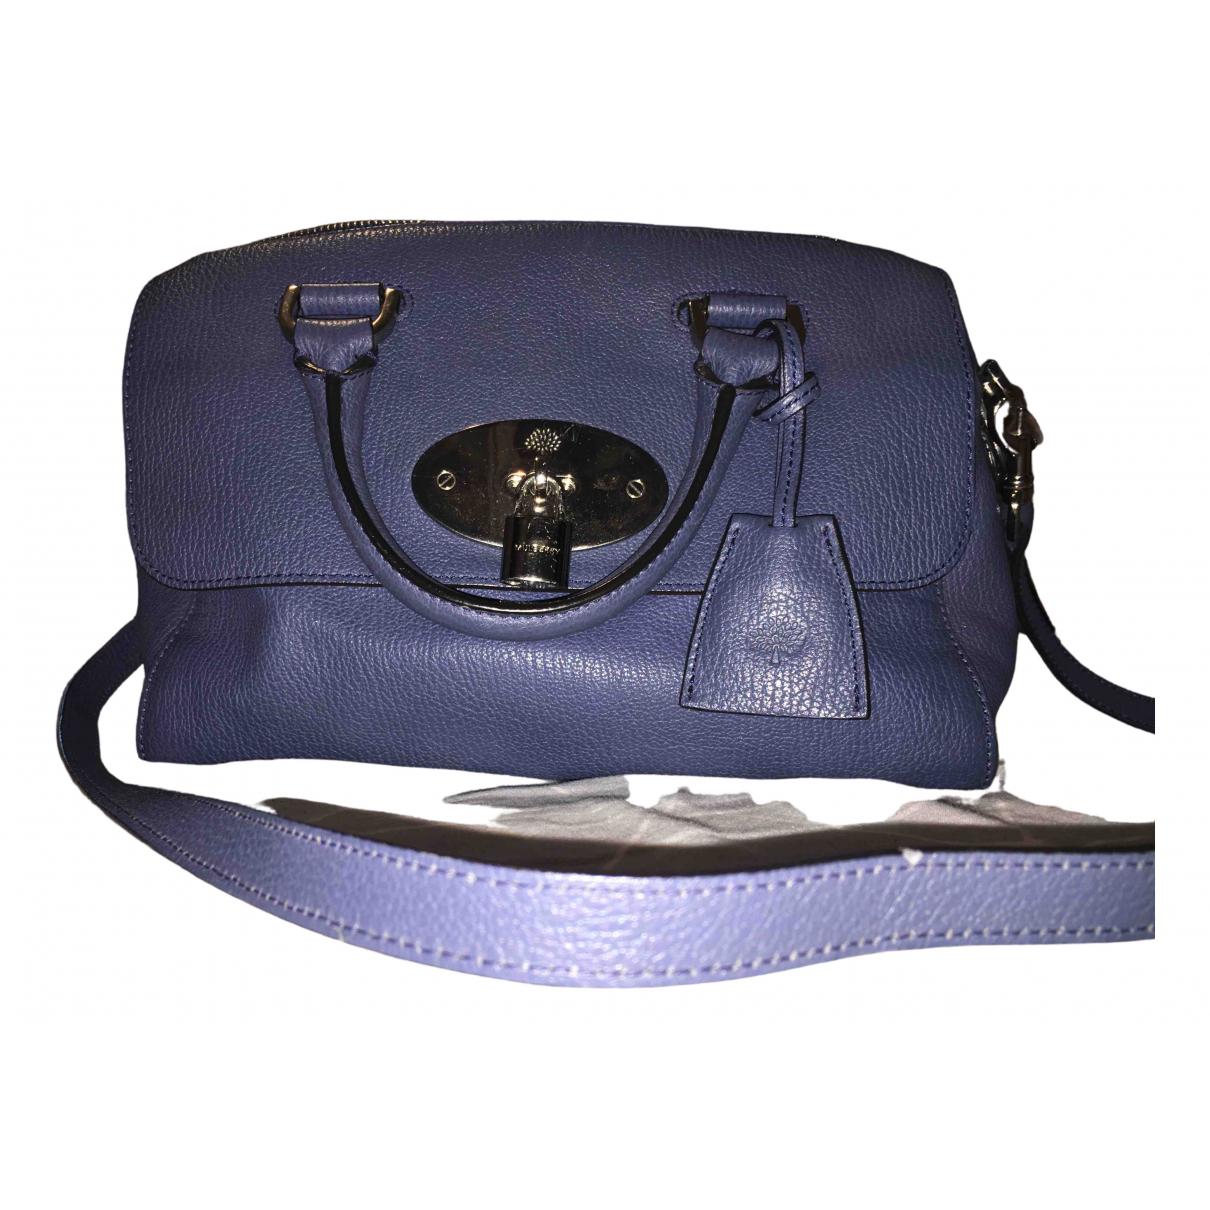 Mulberry Del Rey Handtasche in  Blau Leder